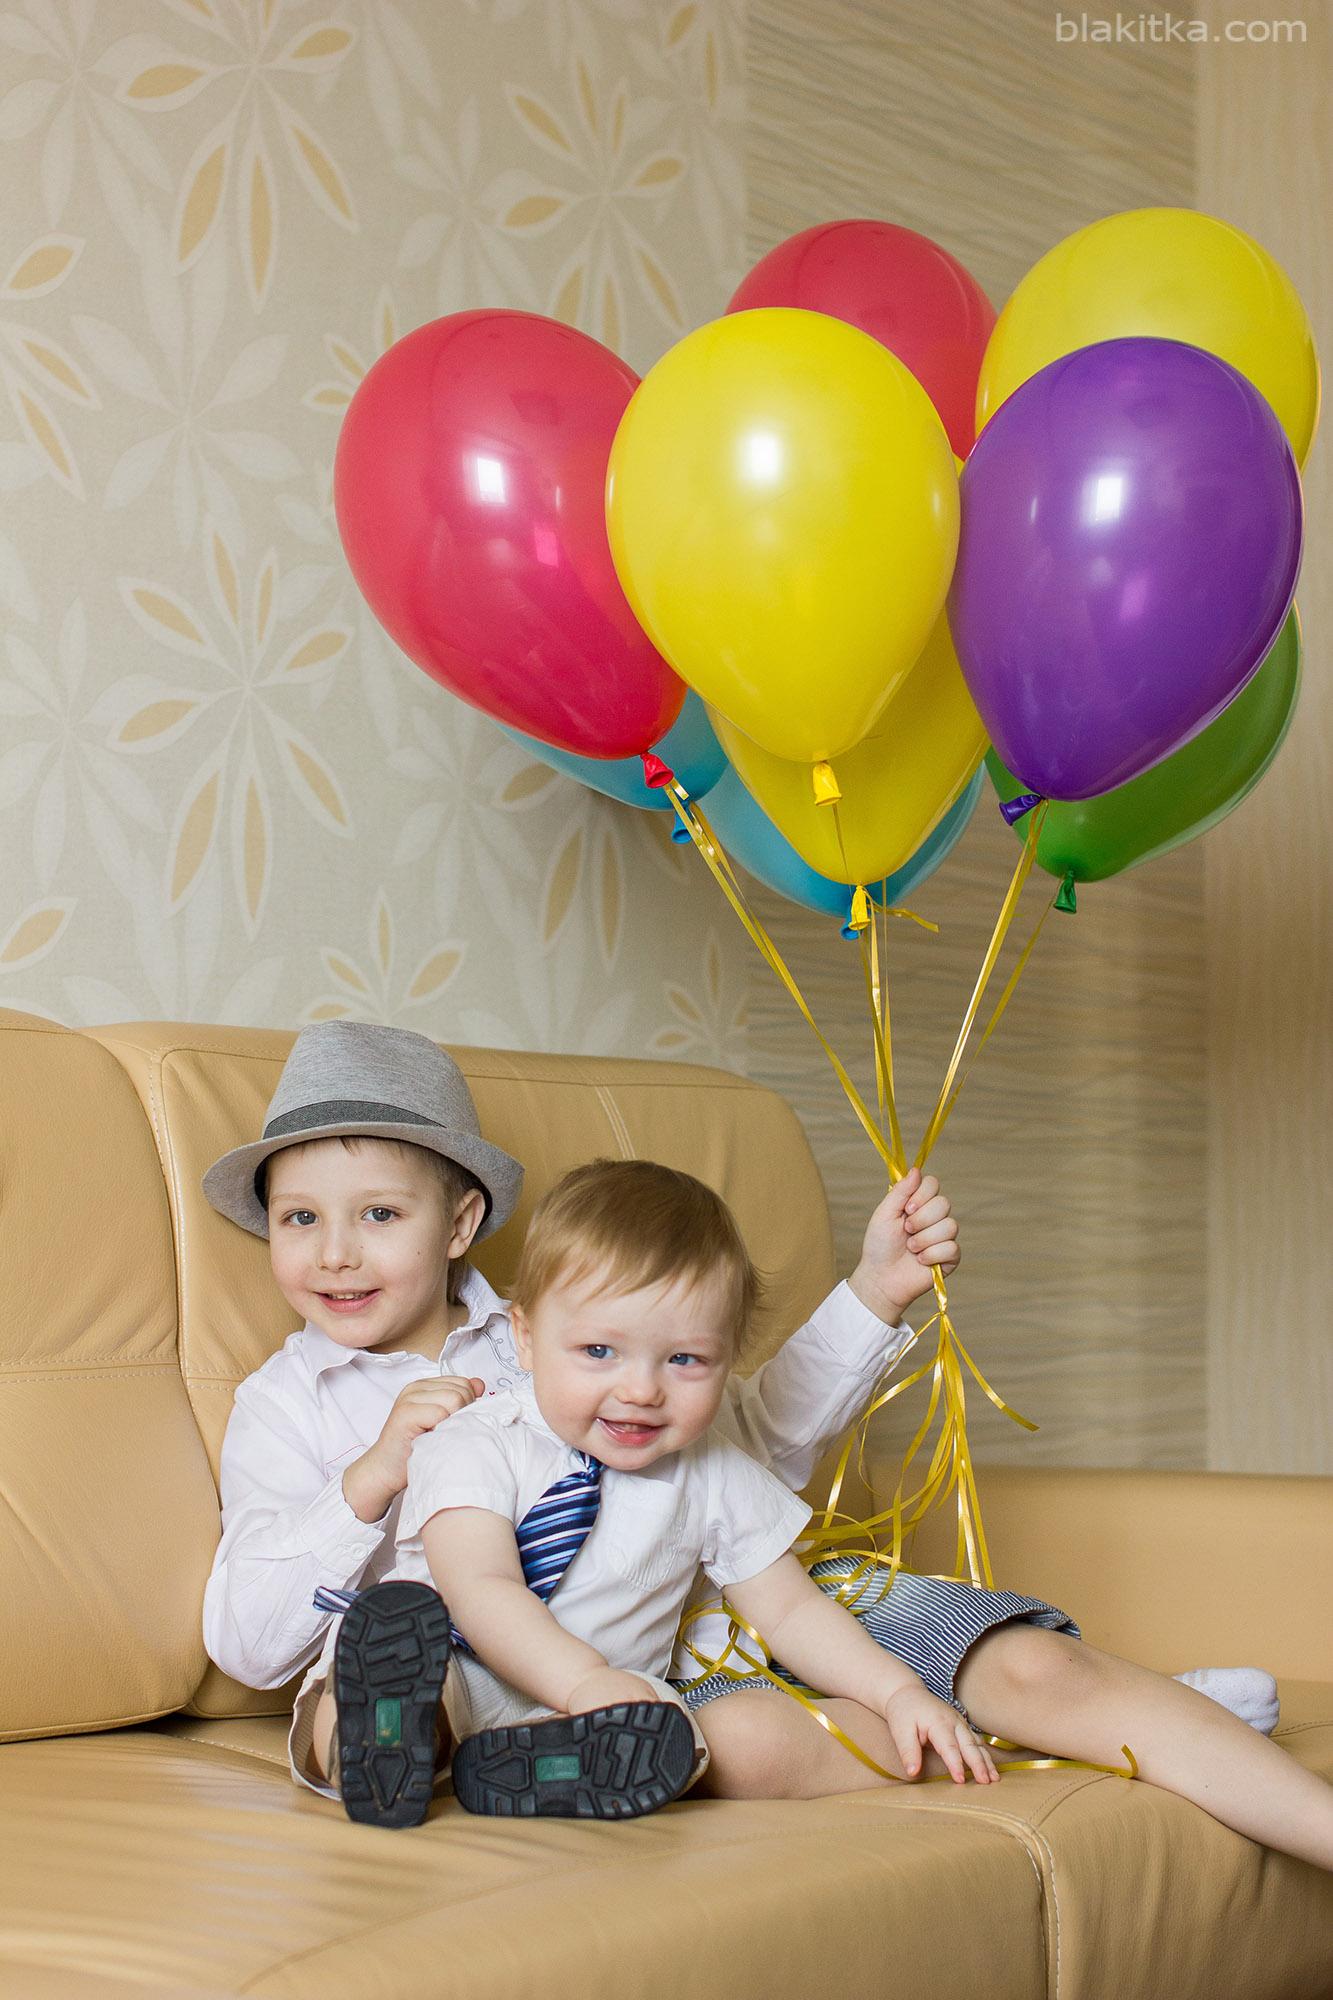 White boys with balloons